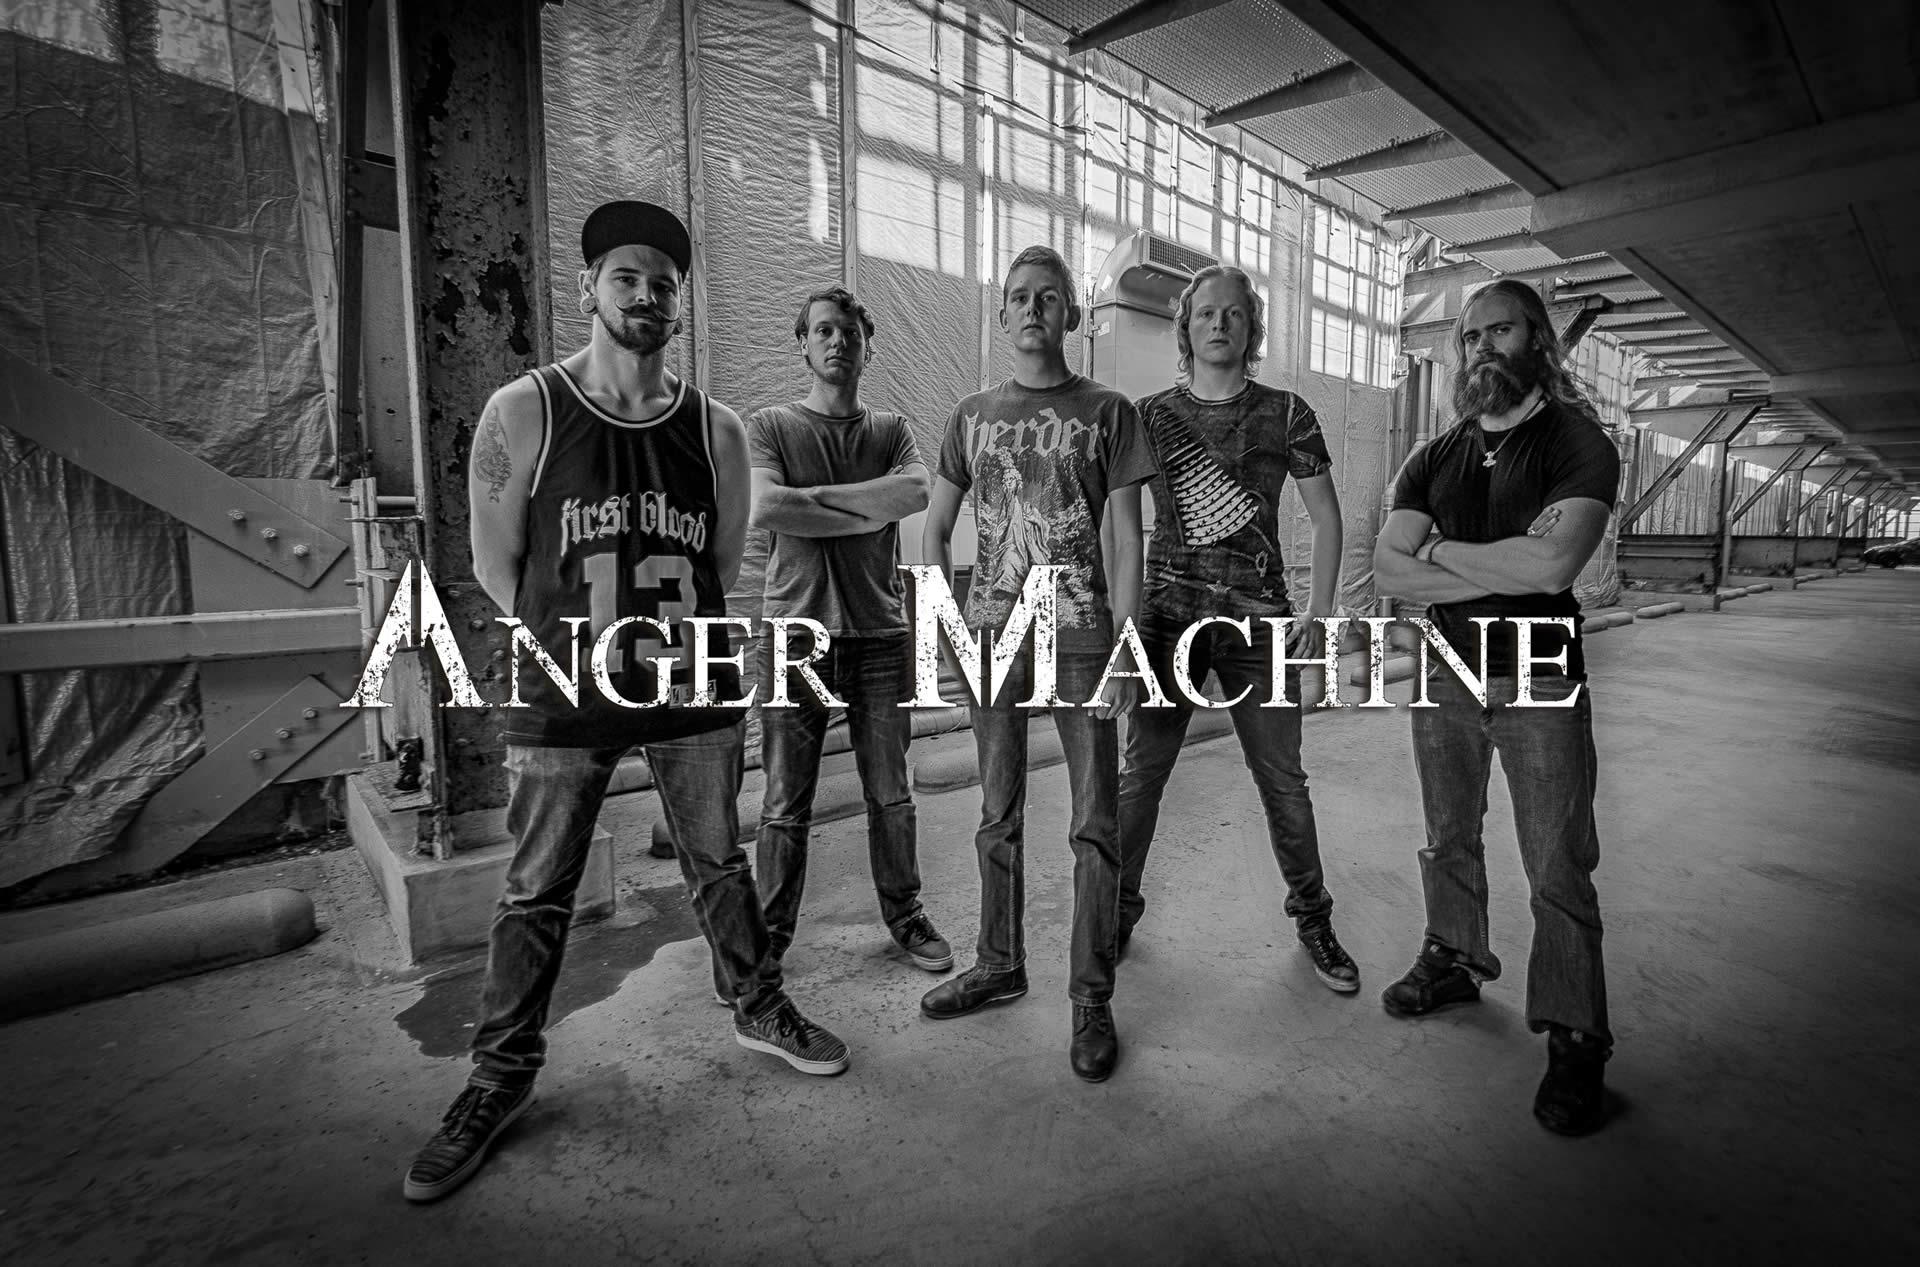 http://www.angermachine.nl/wp-content/uploads/2016/08/slide01-logo-1.jpg